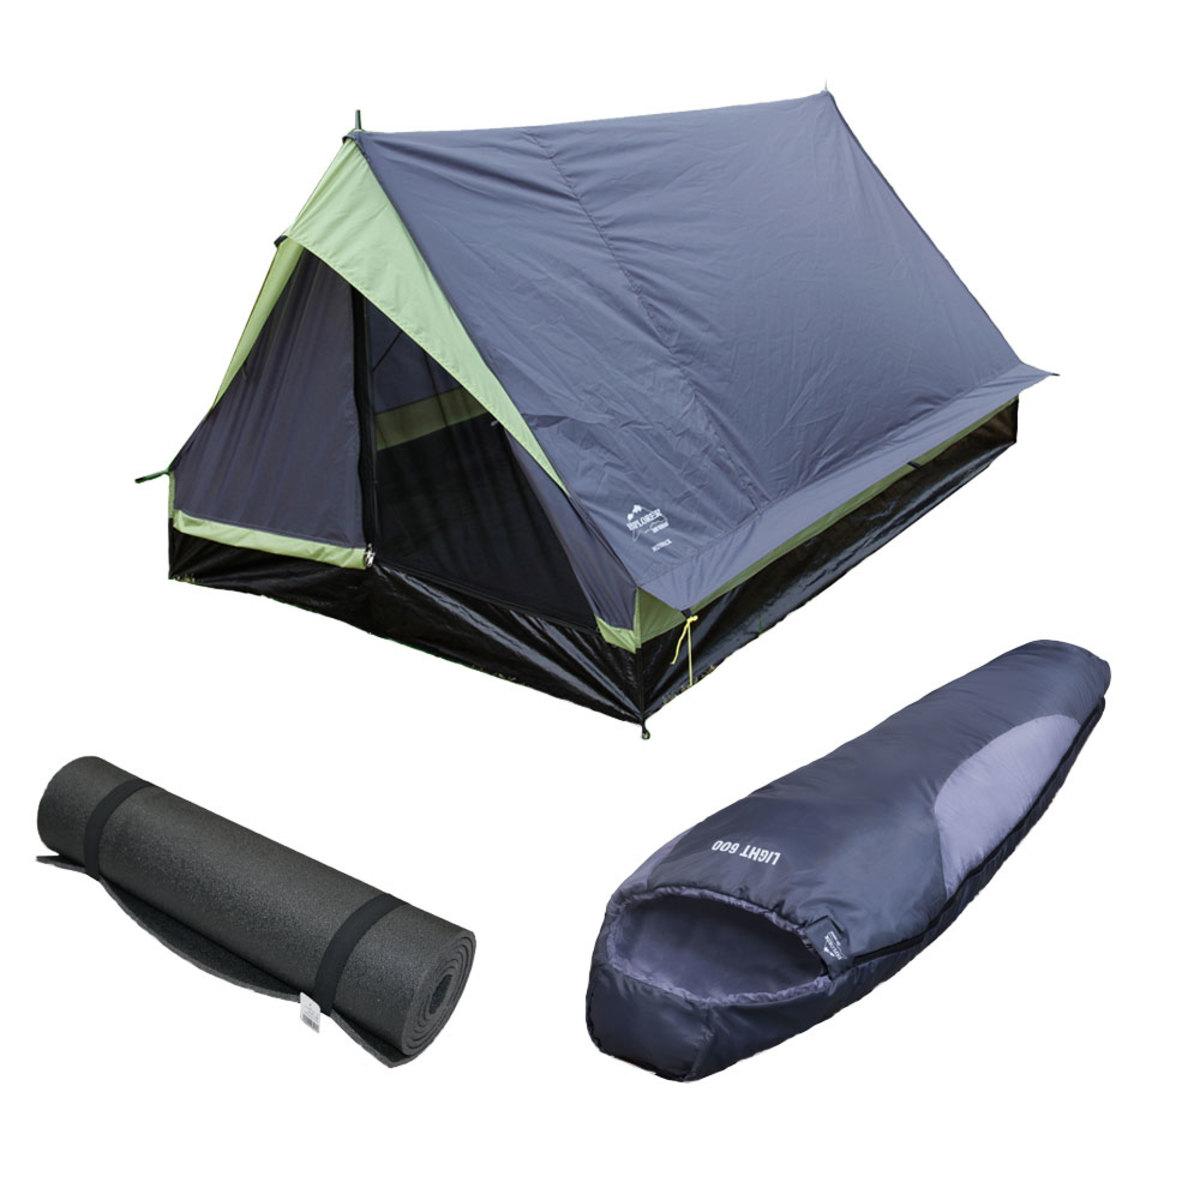 Bild 1 von Explorer Camping / Festival Set